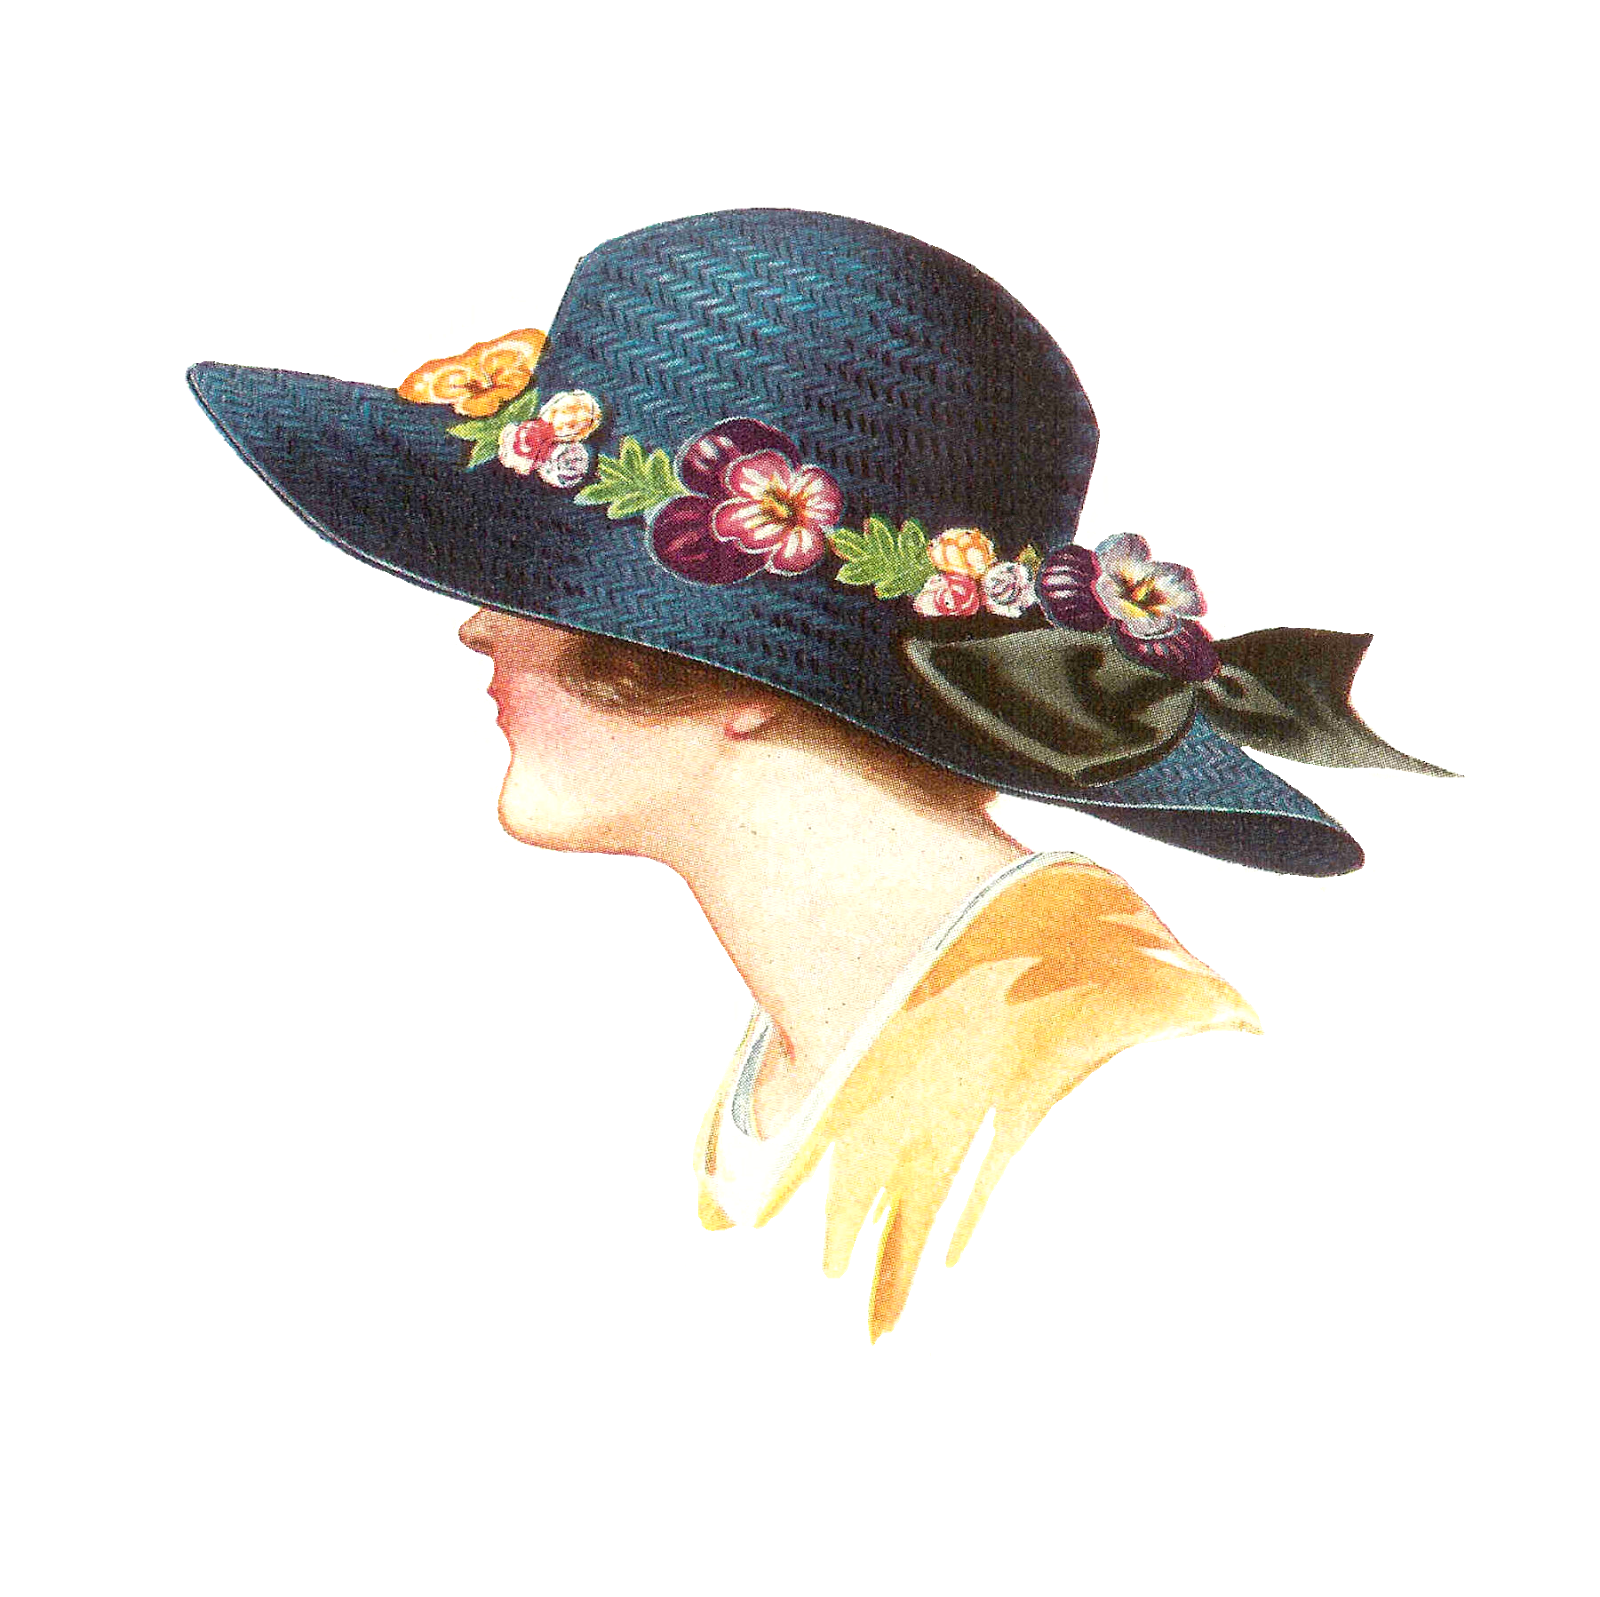 antique images free hat fashion clip art 1915 womens